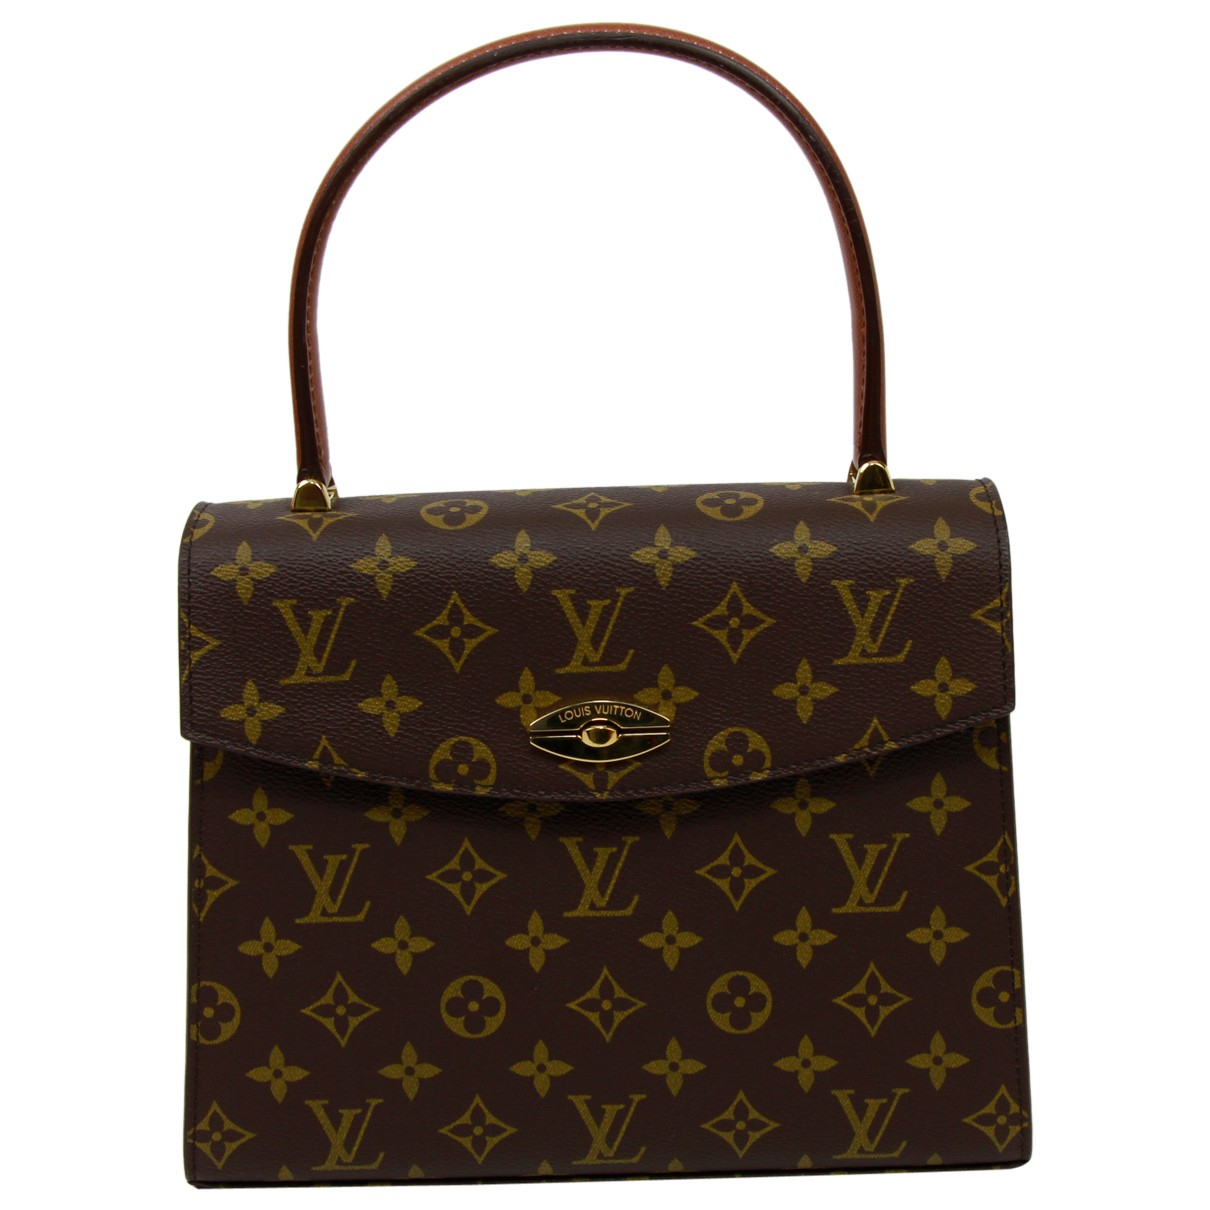 Louis Vuitton - Sac a main Malesherbes pour femme en toile - marron